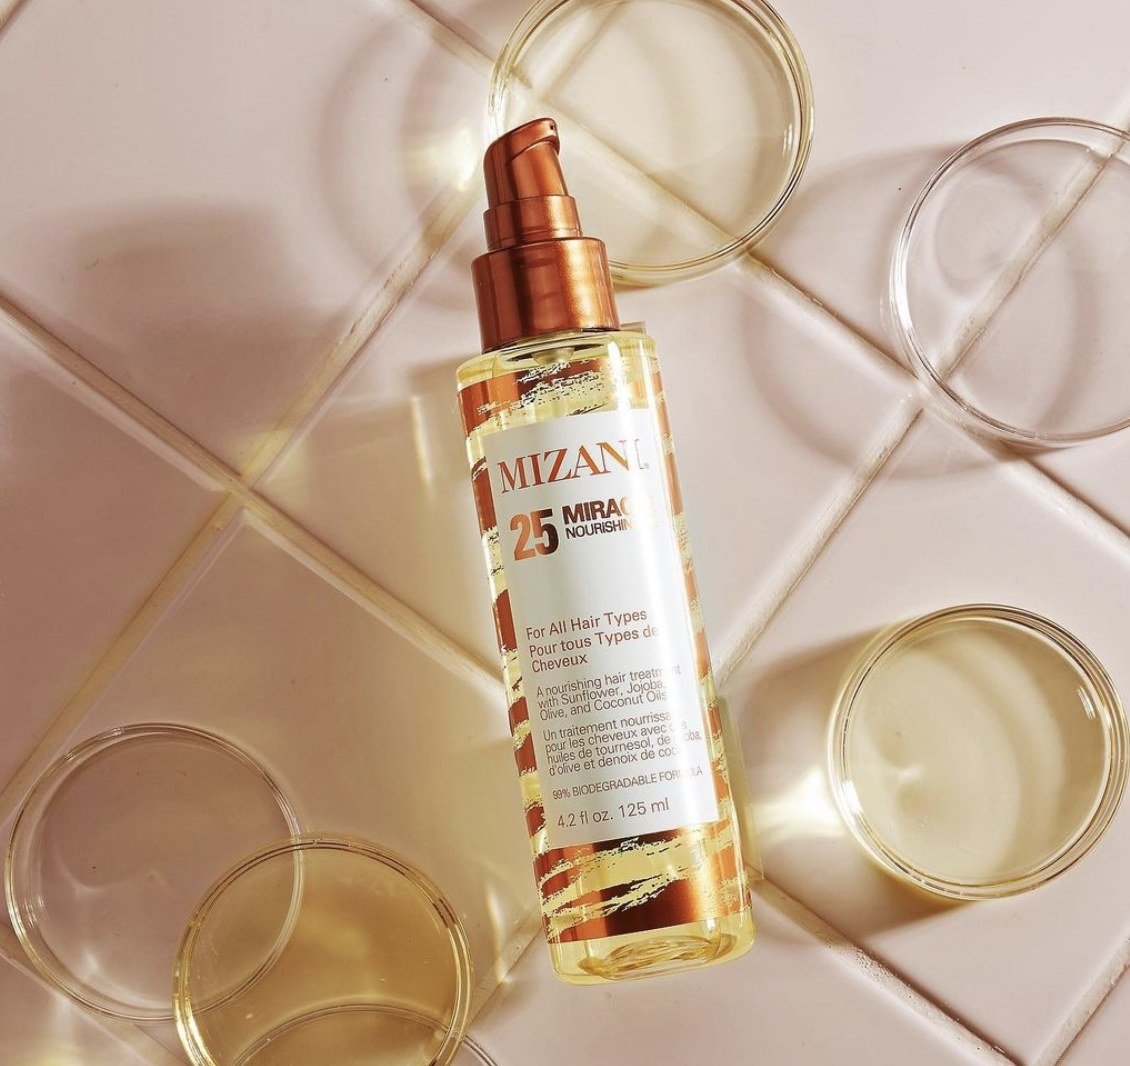 A bottle of hair oil